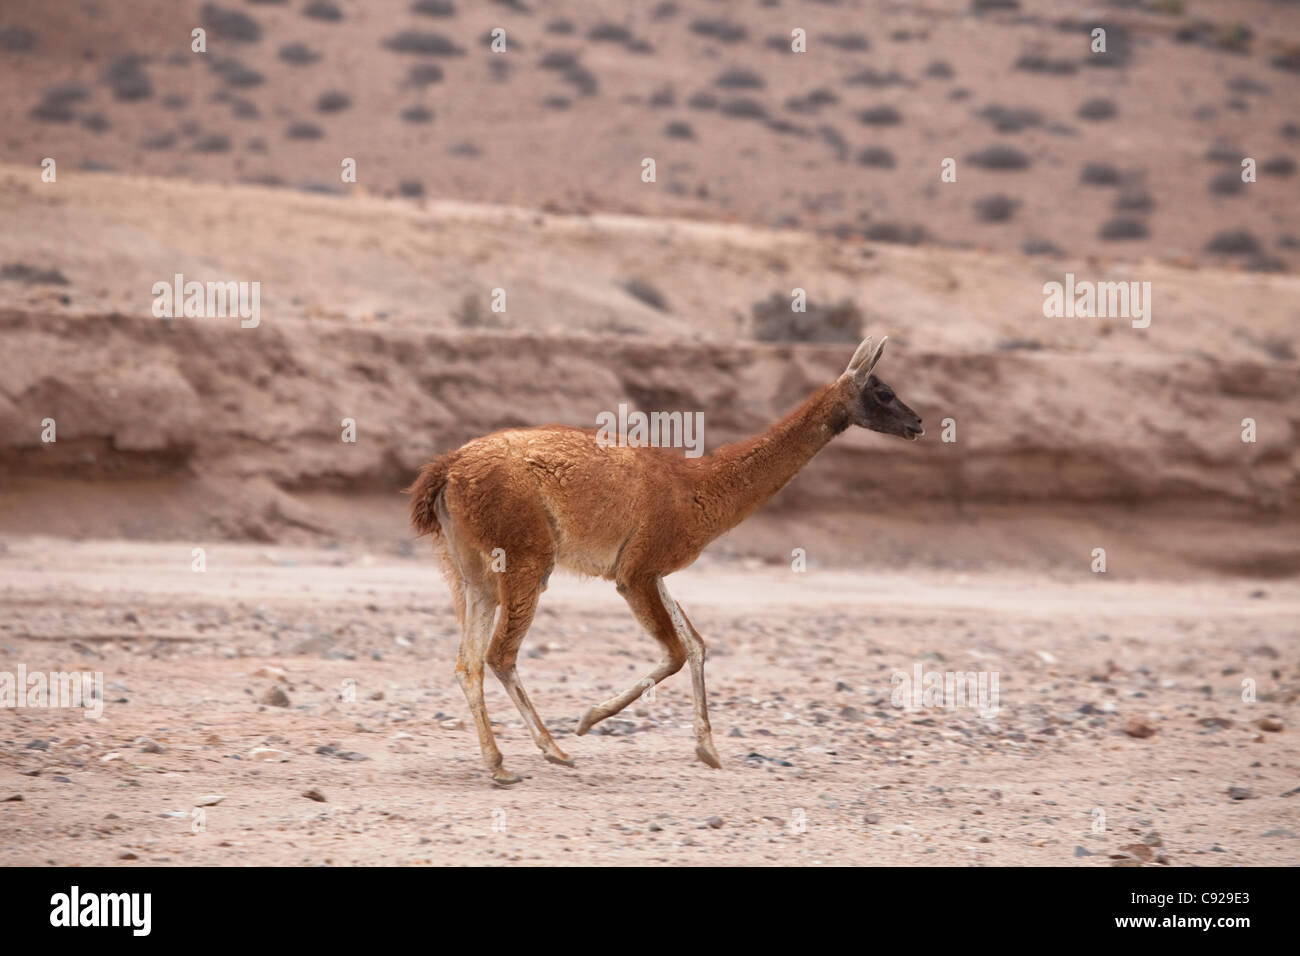 Chile, Parque Nacional Pan de Azucar, guanaco - Stock Image